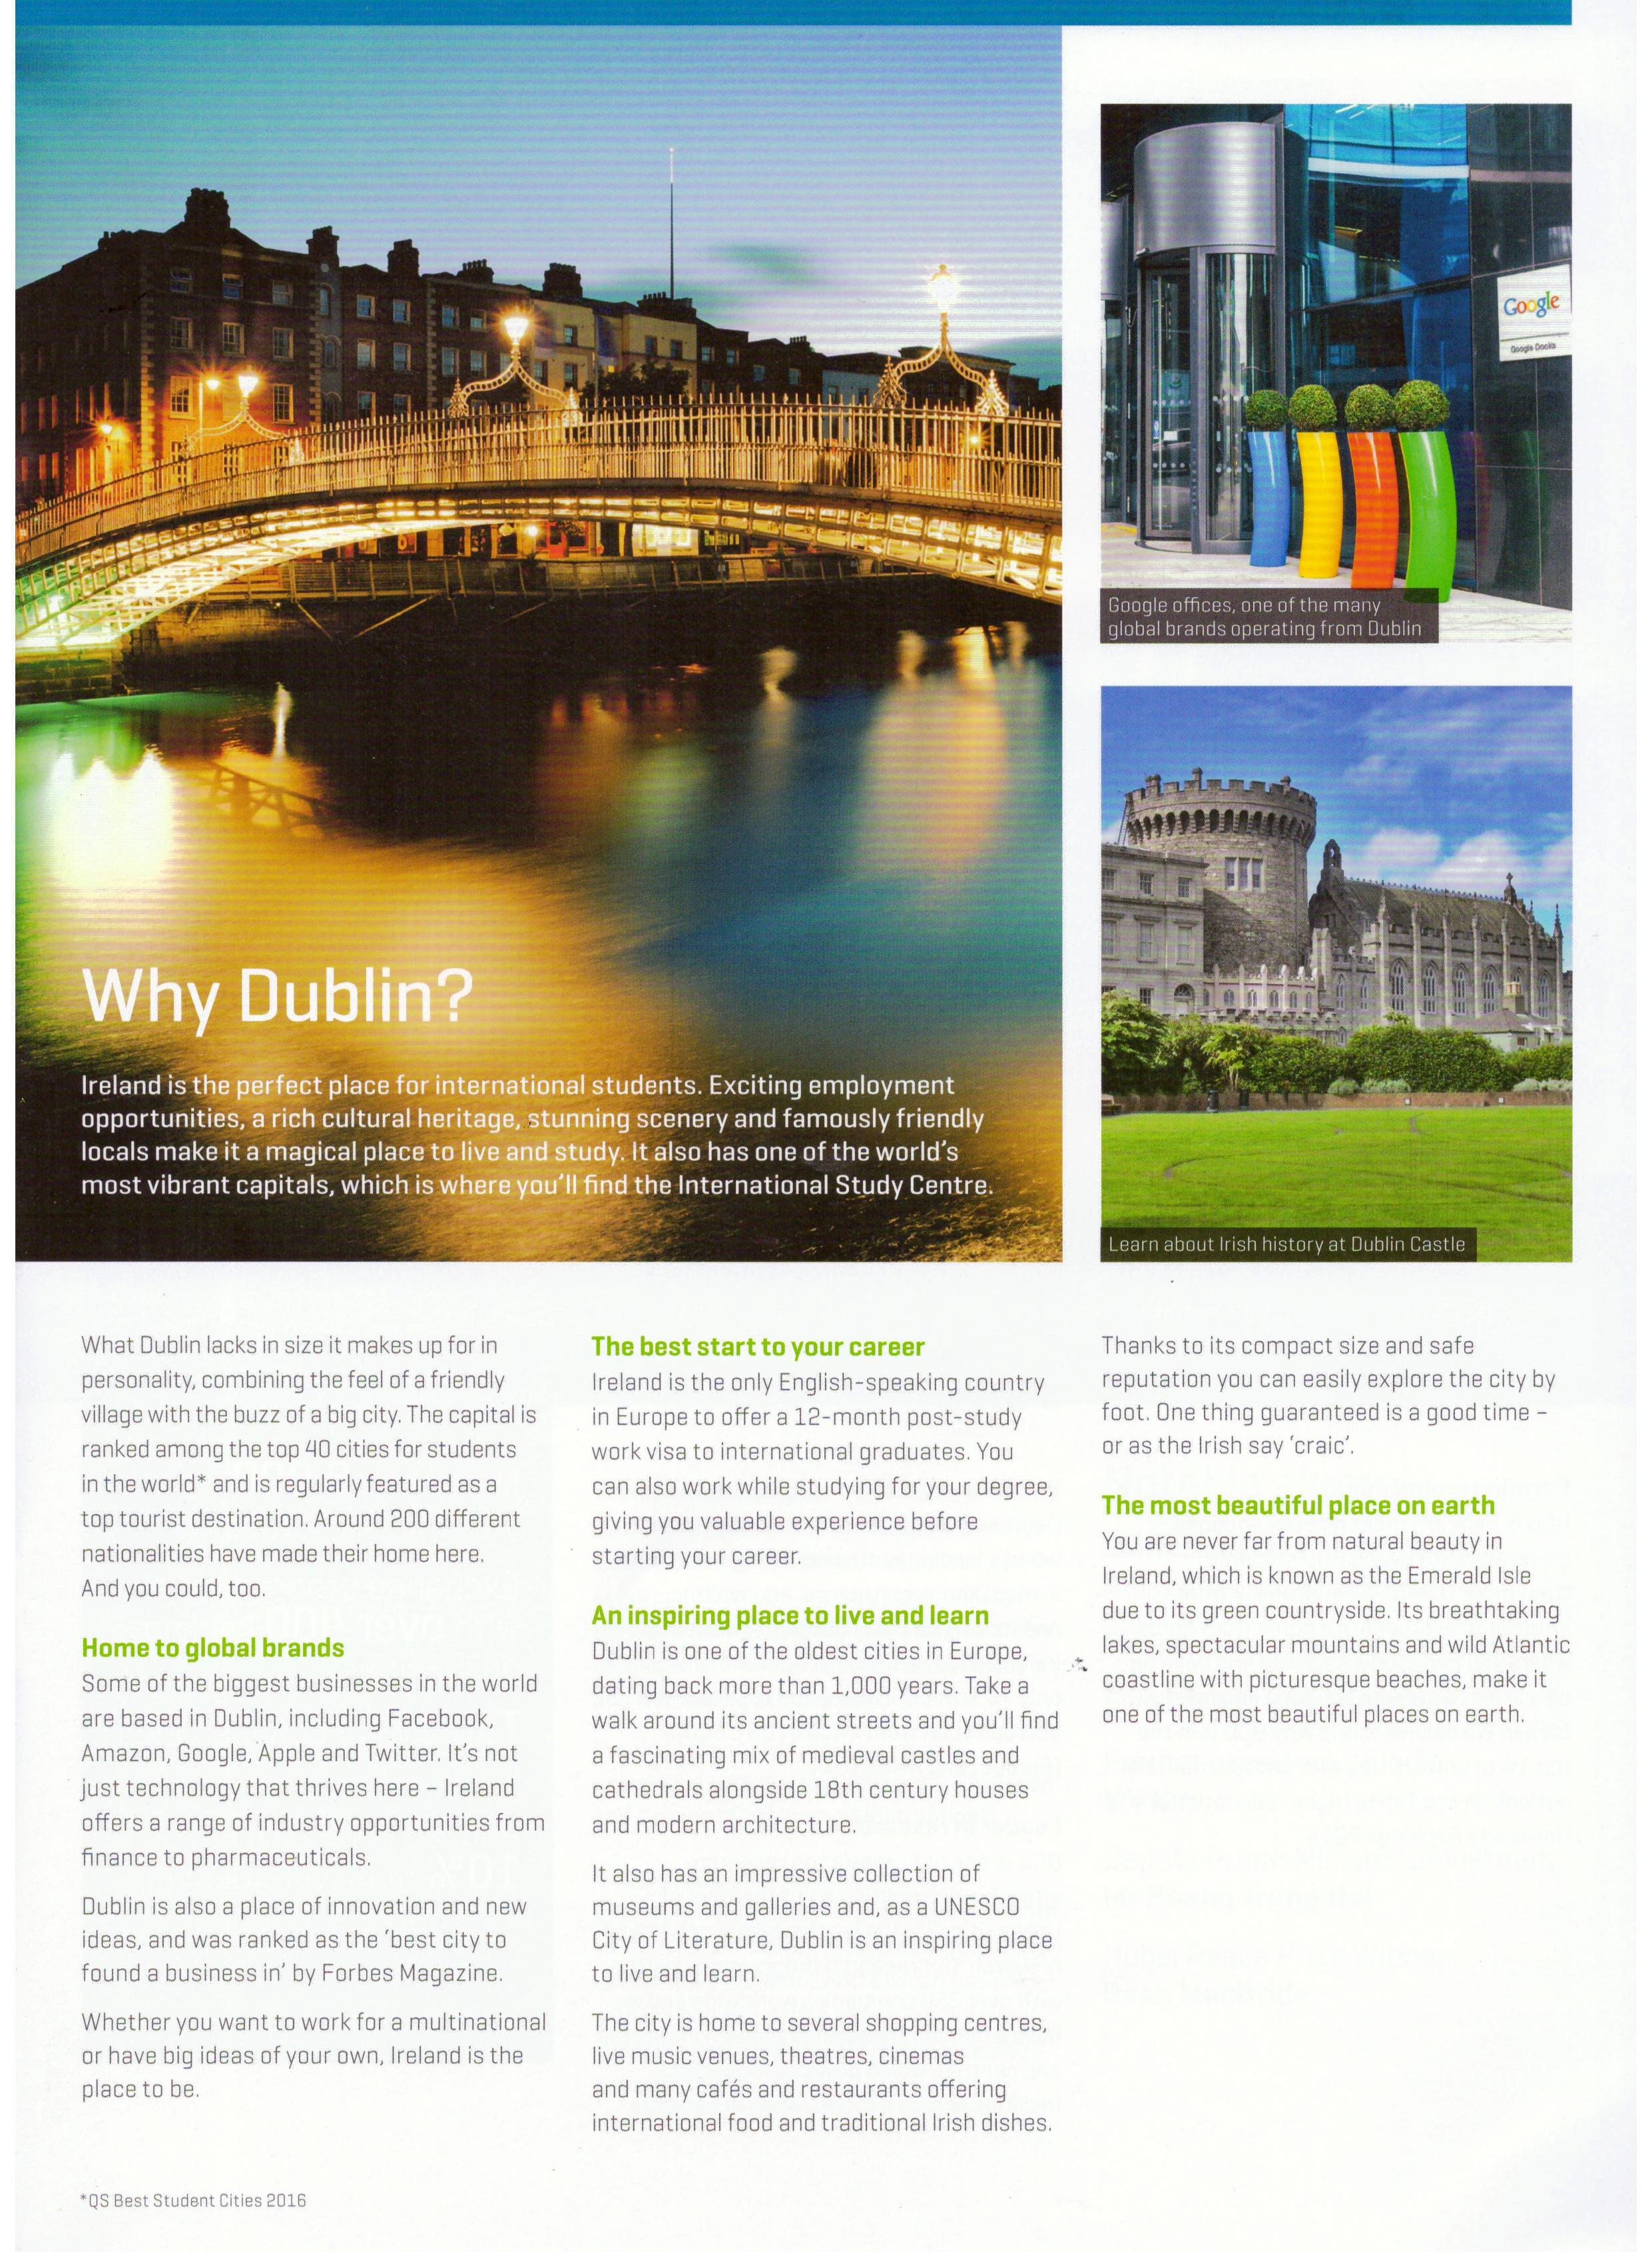 Why Study in Dublin?